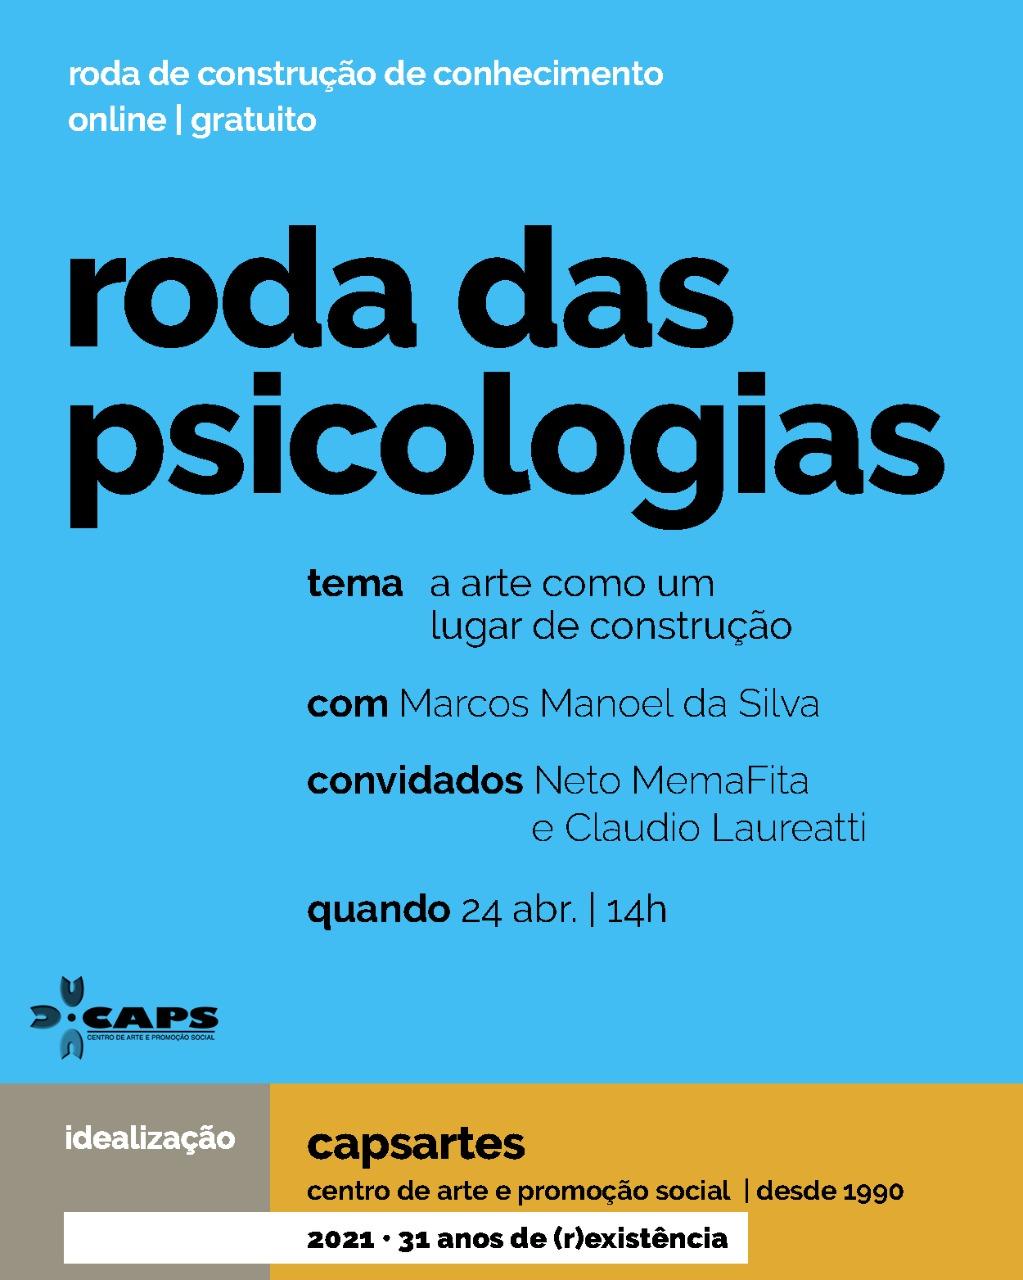 Roda das psicologias